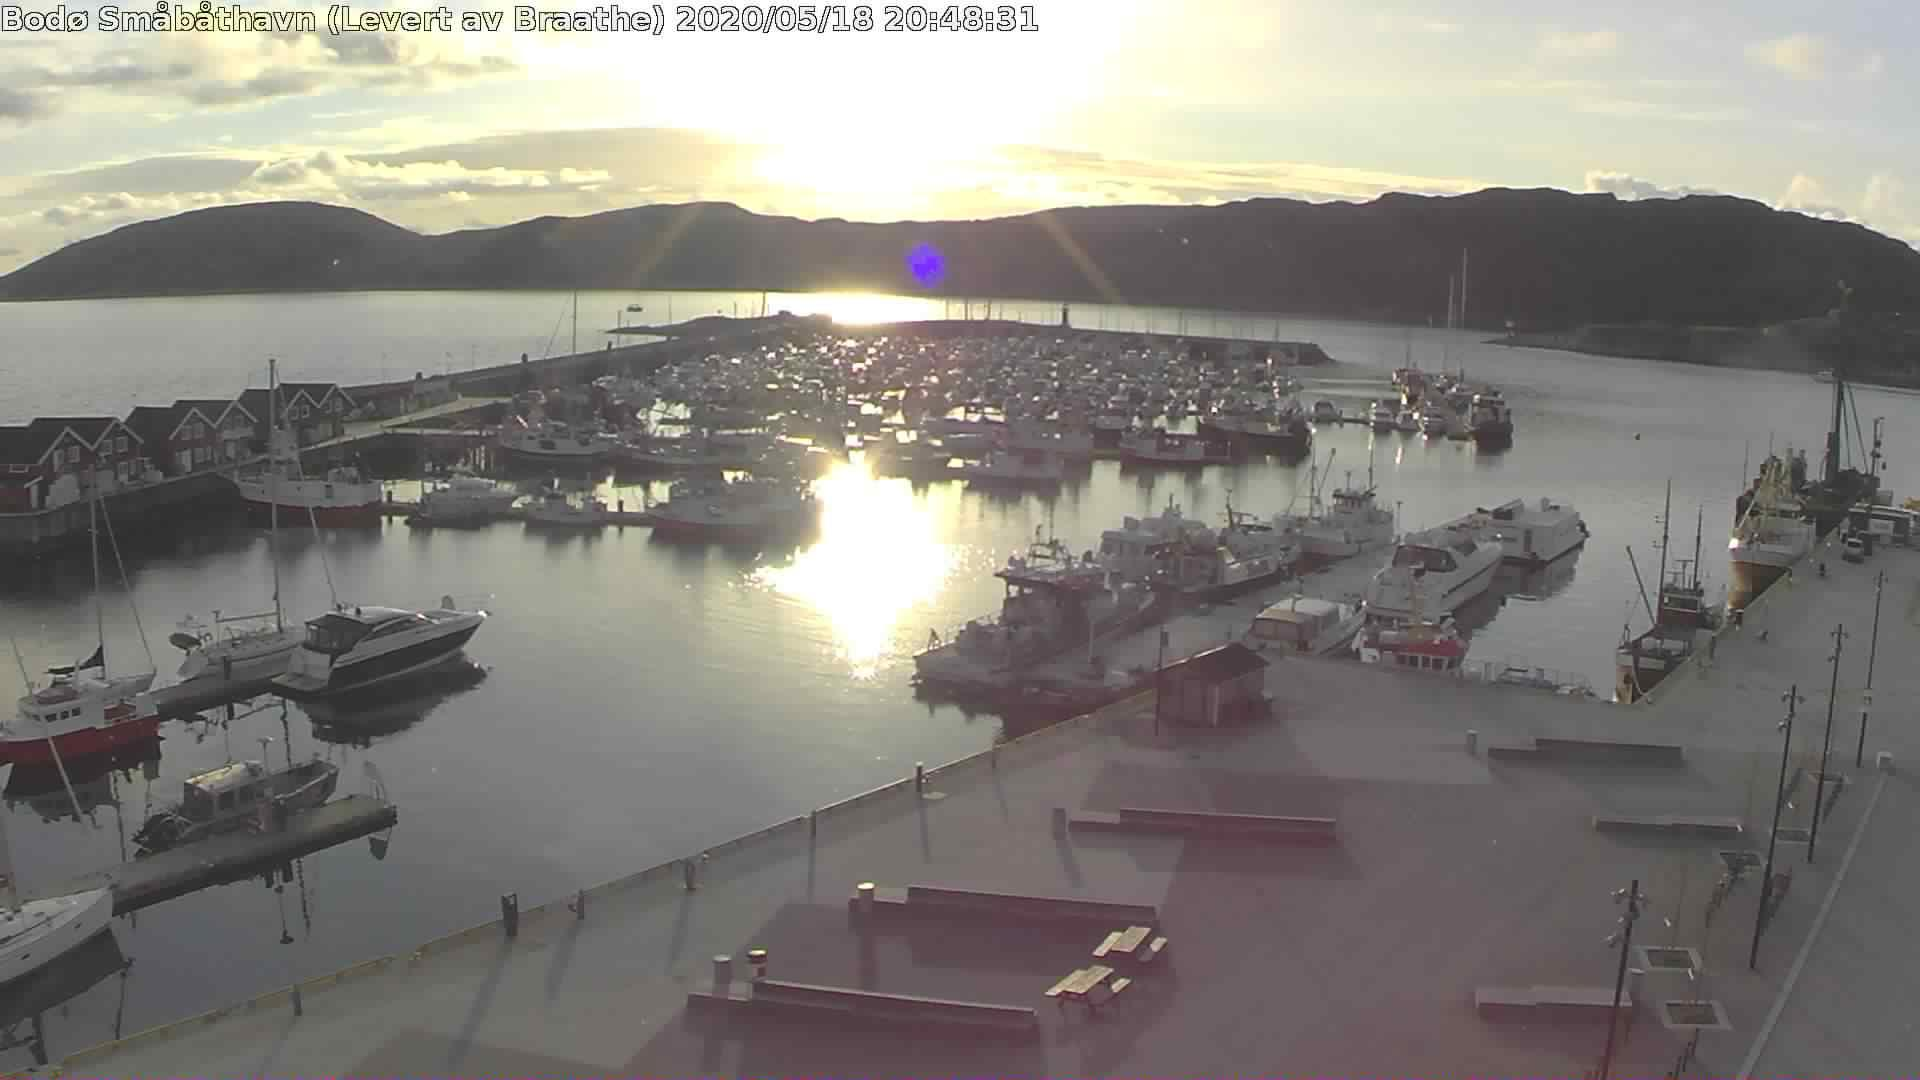 Webcam Bodø: Småbåthavn